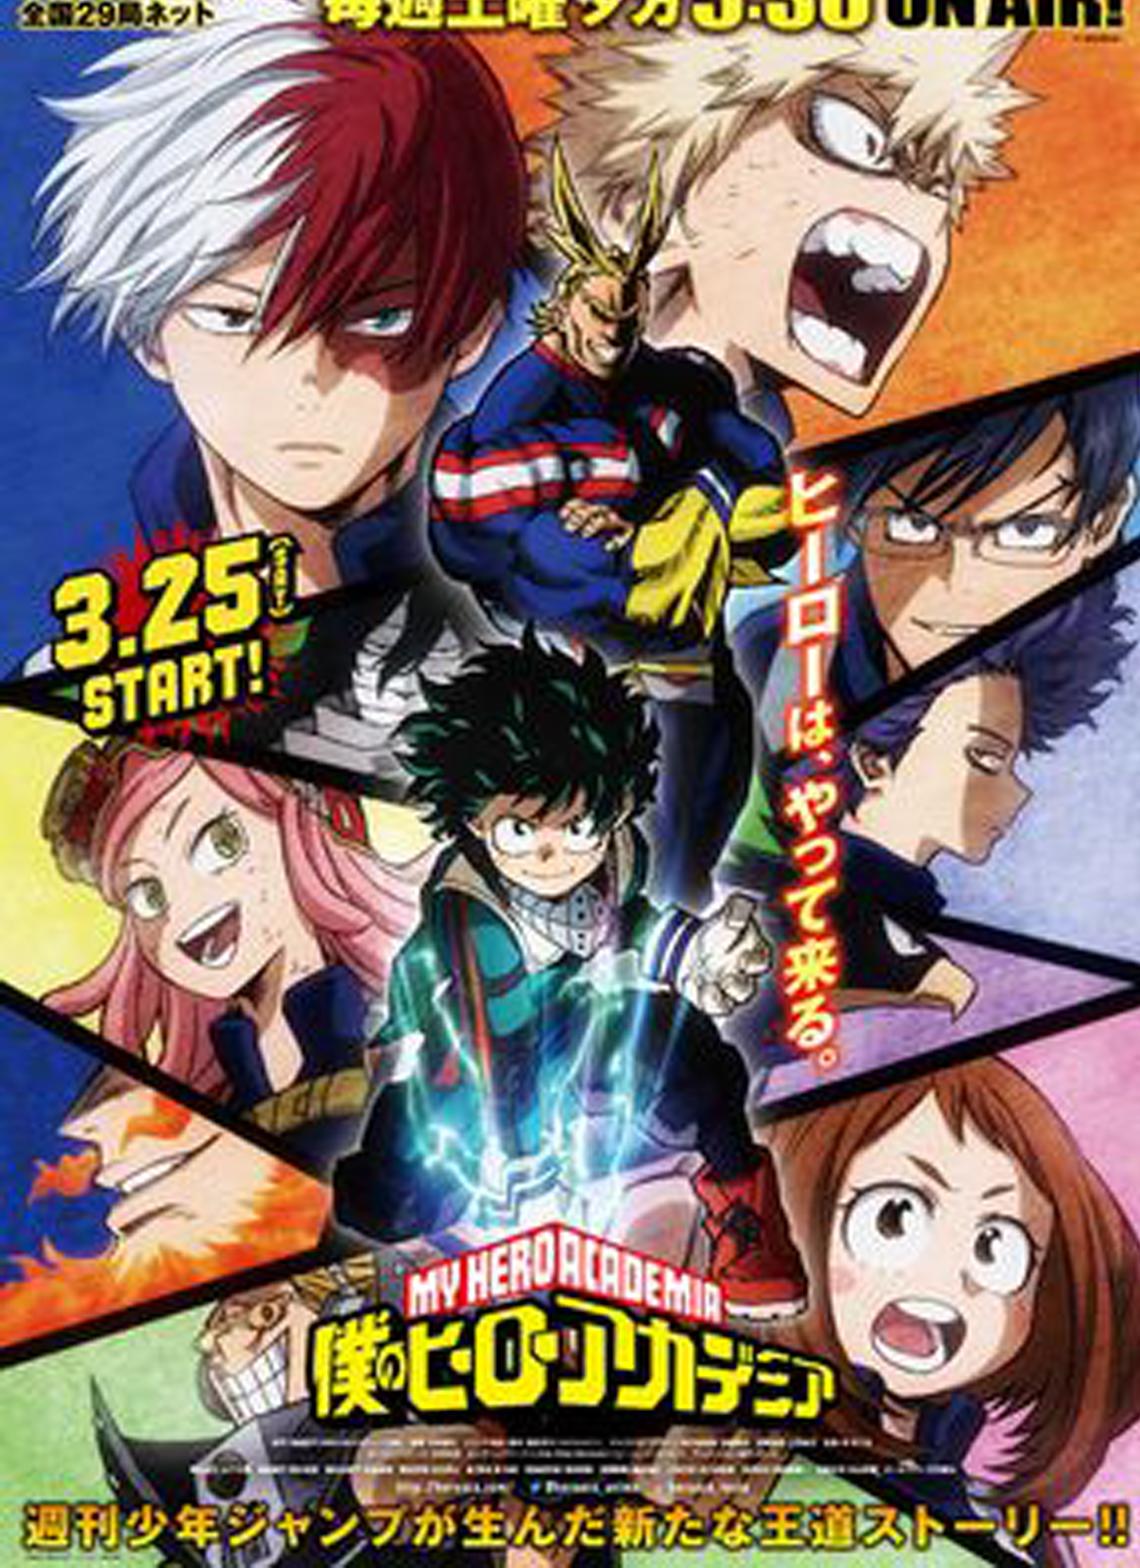 My Hero Academia 02 Vostfr : academia, vostfr, Academy, Season, Anime,, Personagens, Super, Anime